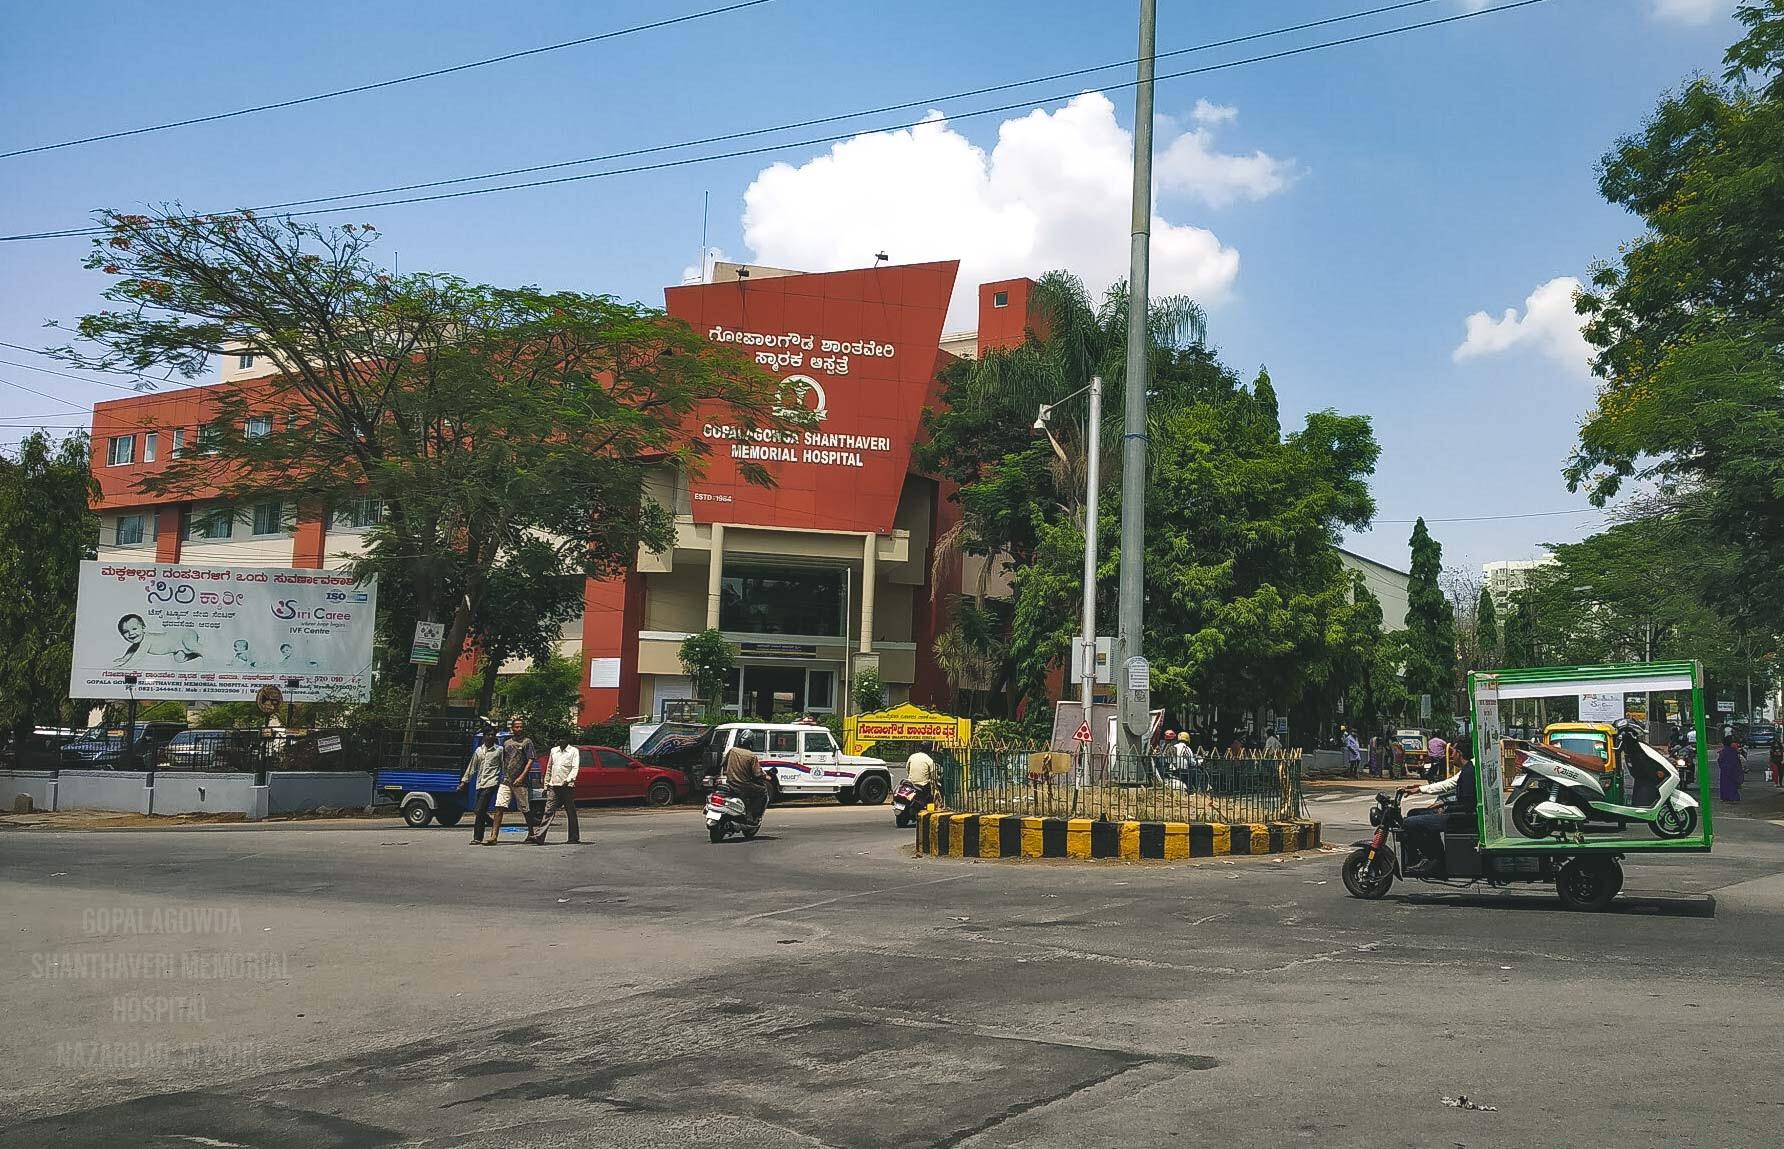 Gopalan Gowda Shanthaveri Memorial Hospital Nazarbad Mysore